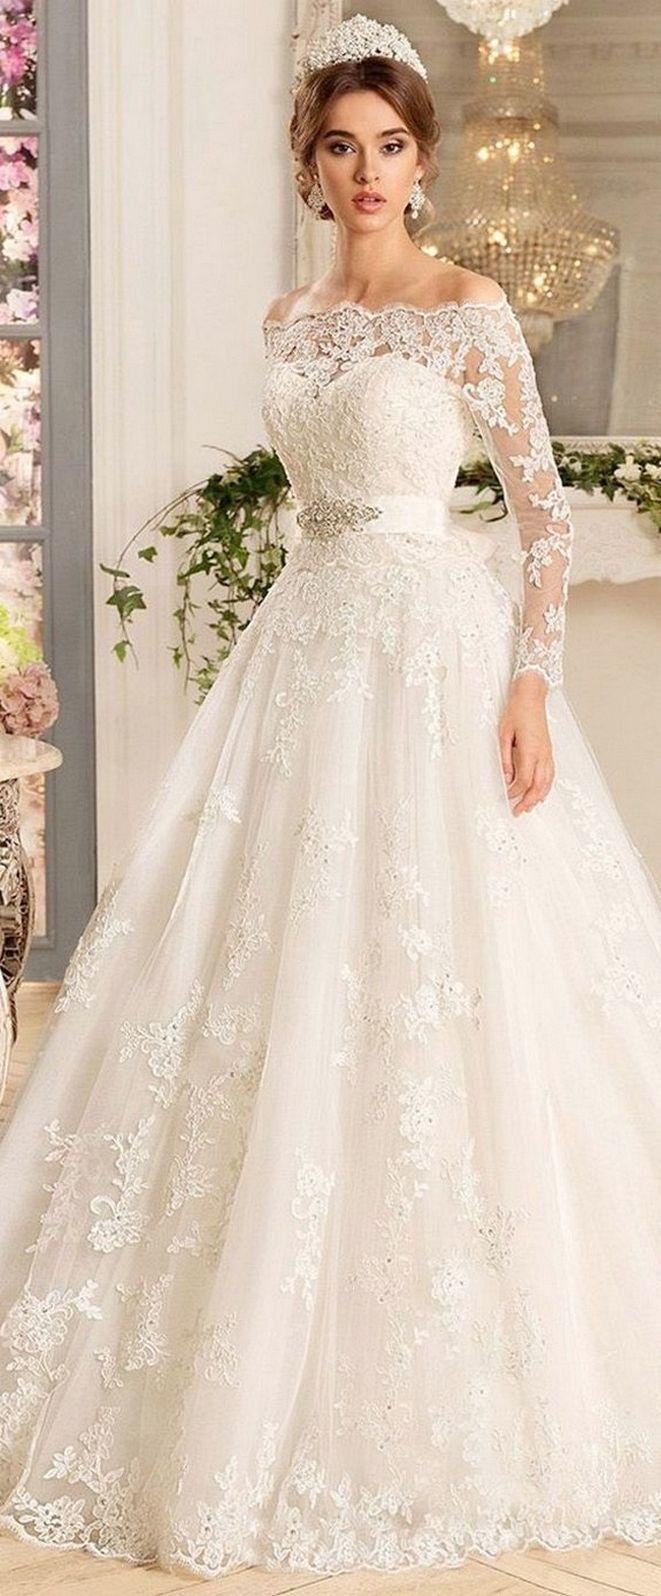 Eyecatching romantic valentineus day wedding dress ideas